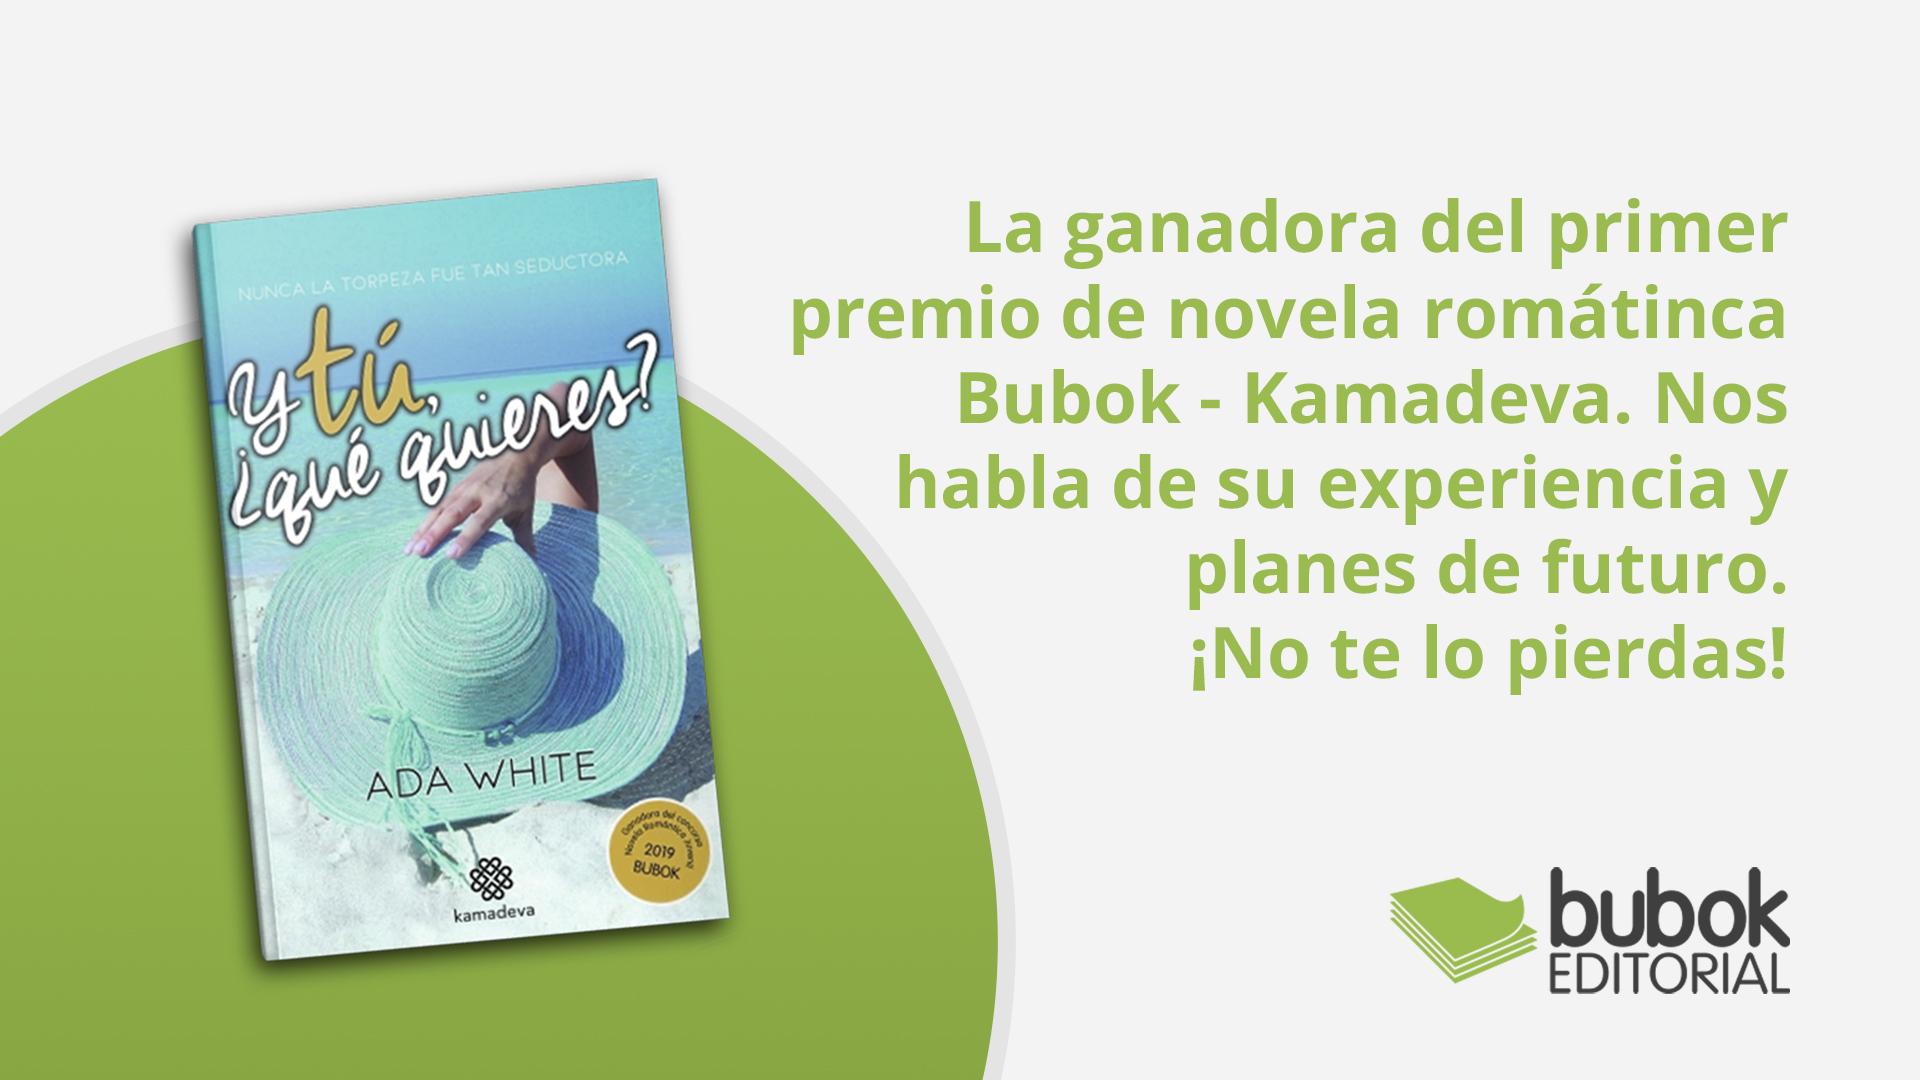 Entrevistamos a la ganadora del primer premio de novela romátinca Bubok - Kamadeva.